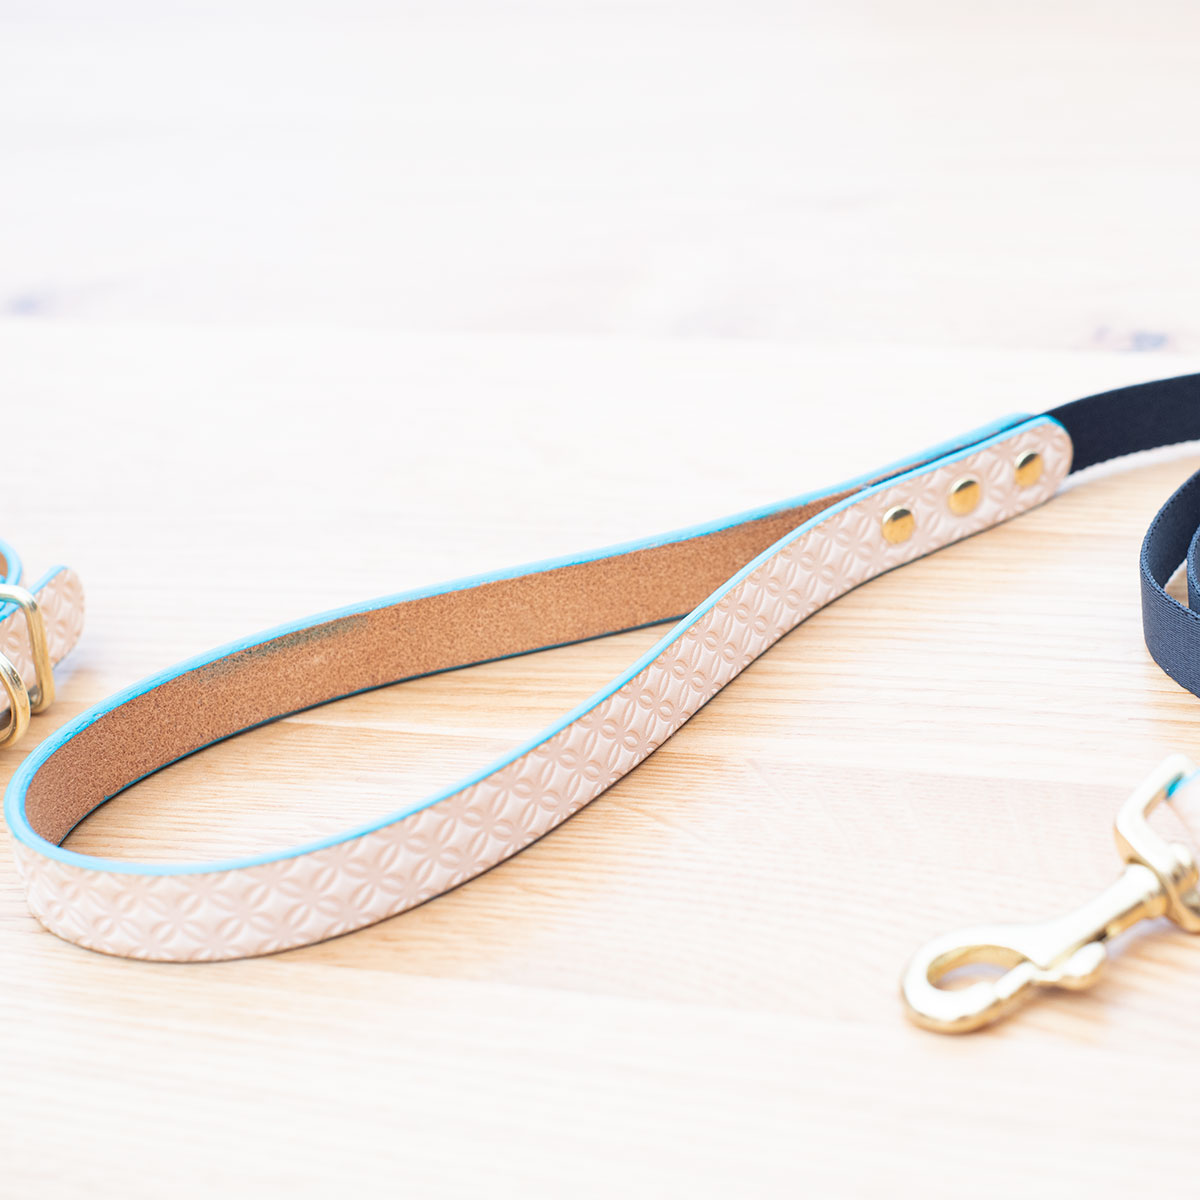 [#A8897]サクラ犬具製作所 本革 七宝文様 shippo 和柄型押し模様首輪  日本製